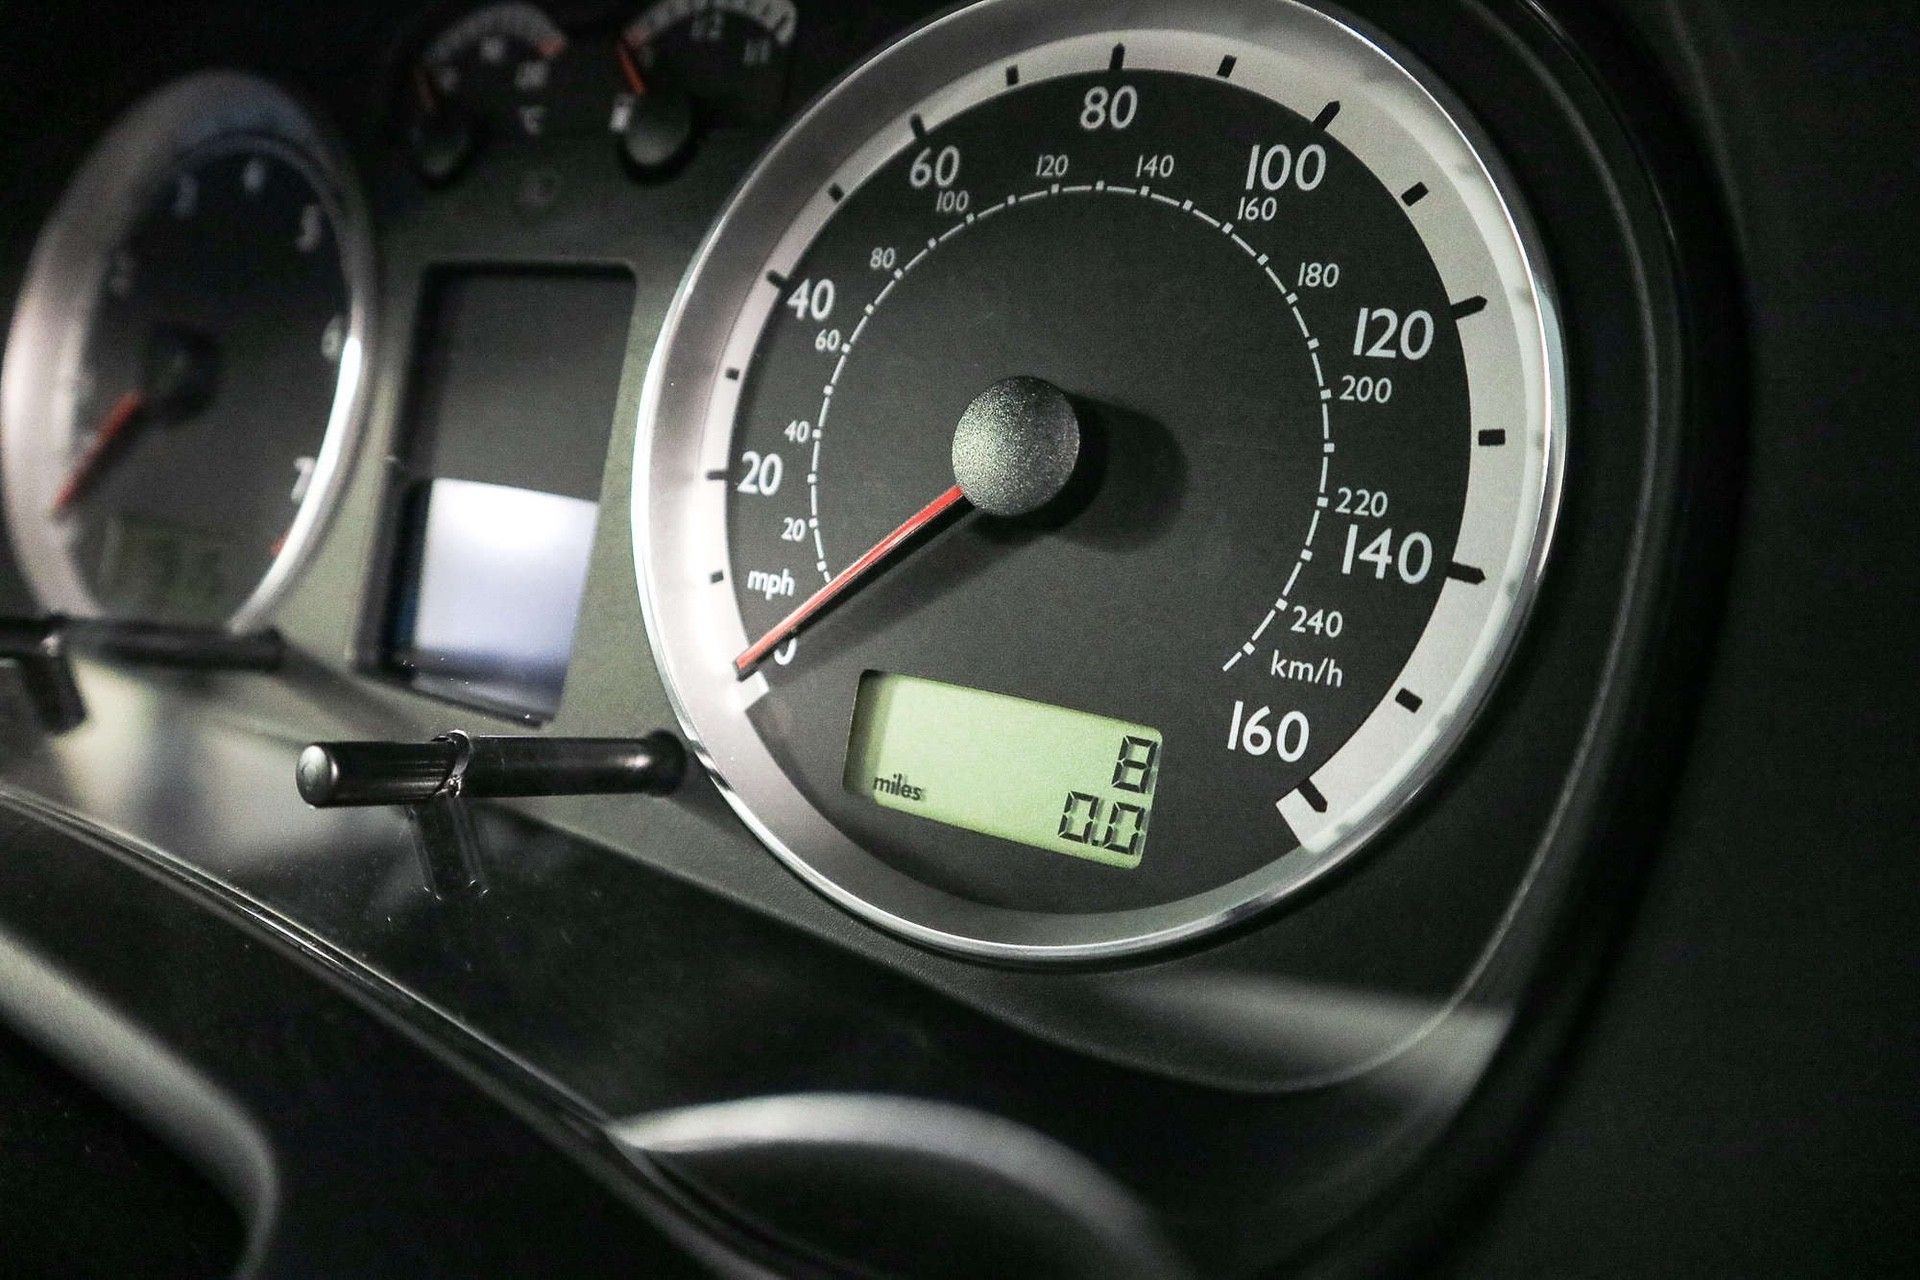 2002_VW_Golf_GTI_25th_Anniversary_Edition_sale-0011